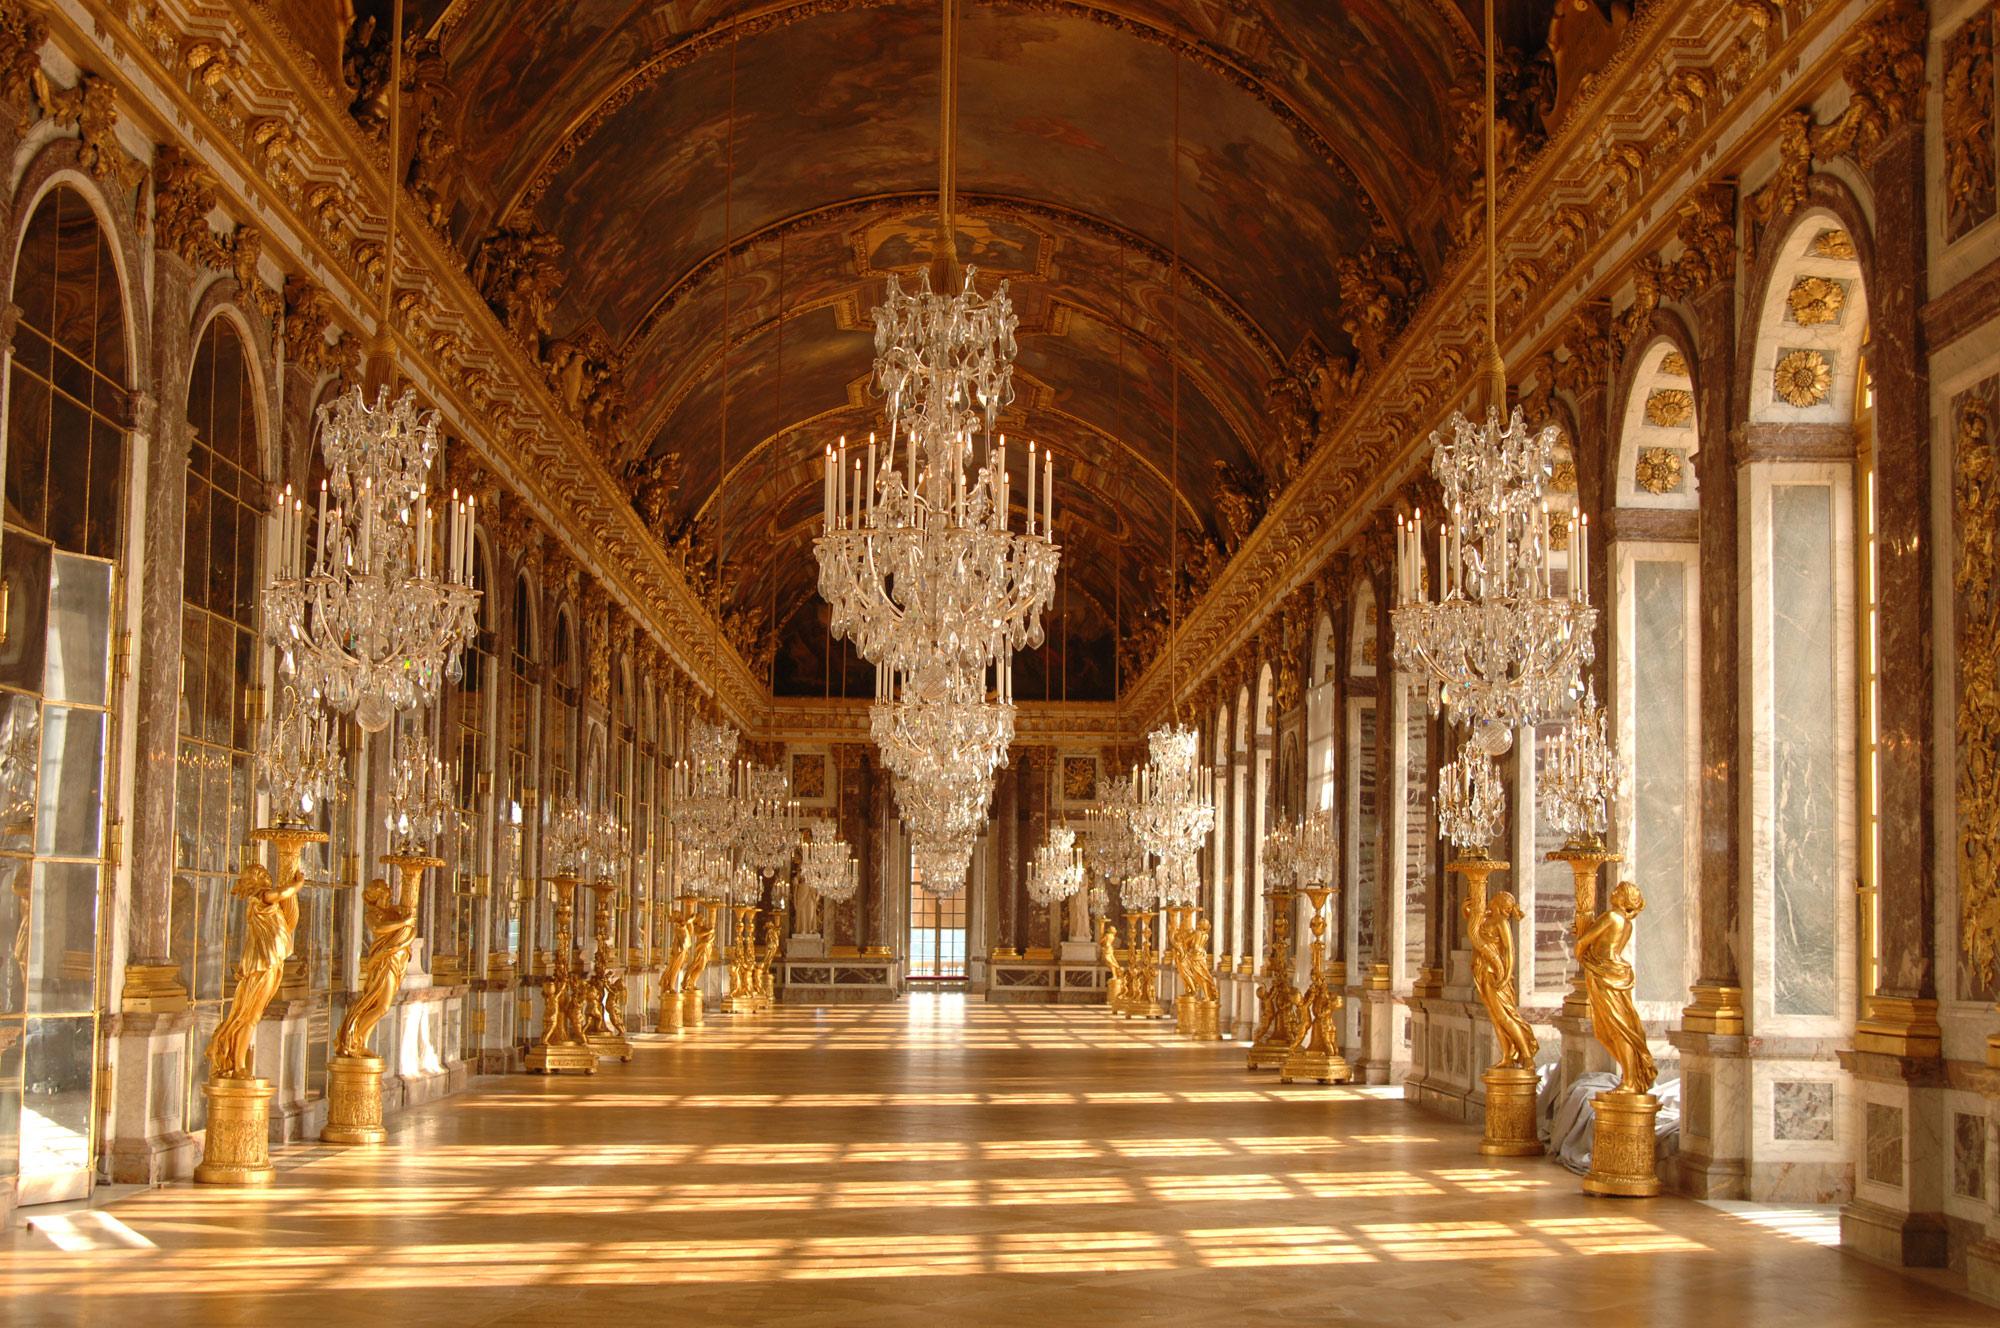 baroque architecture – 3travellingacrosstime